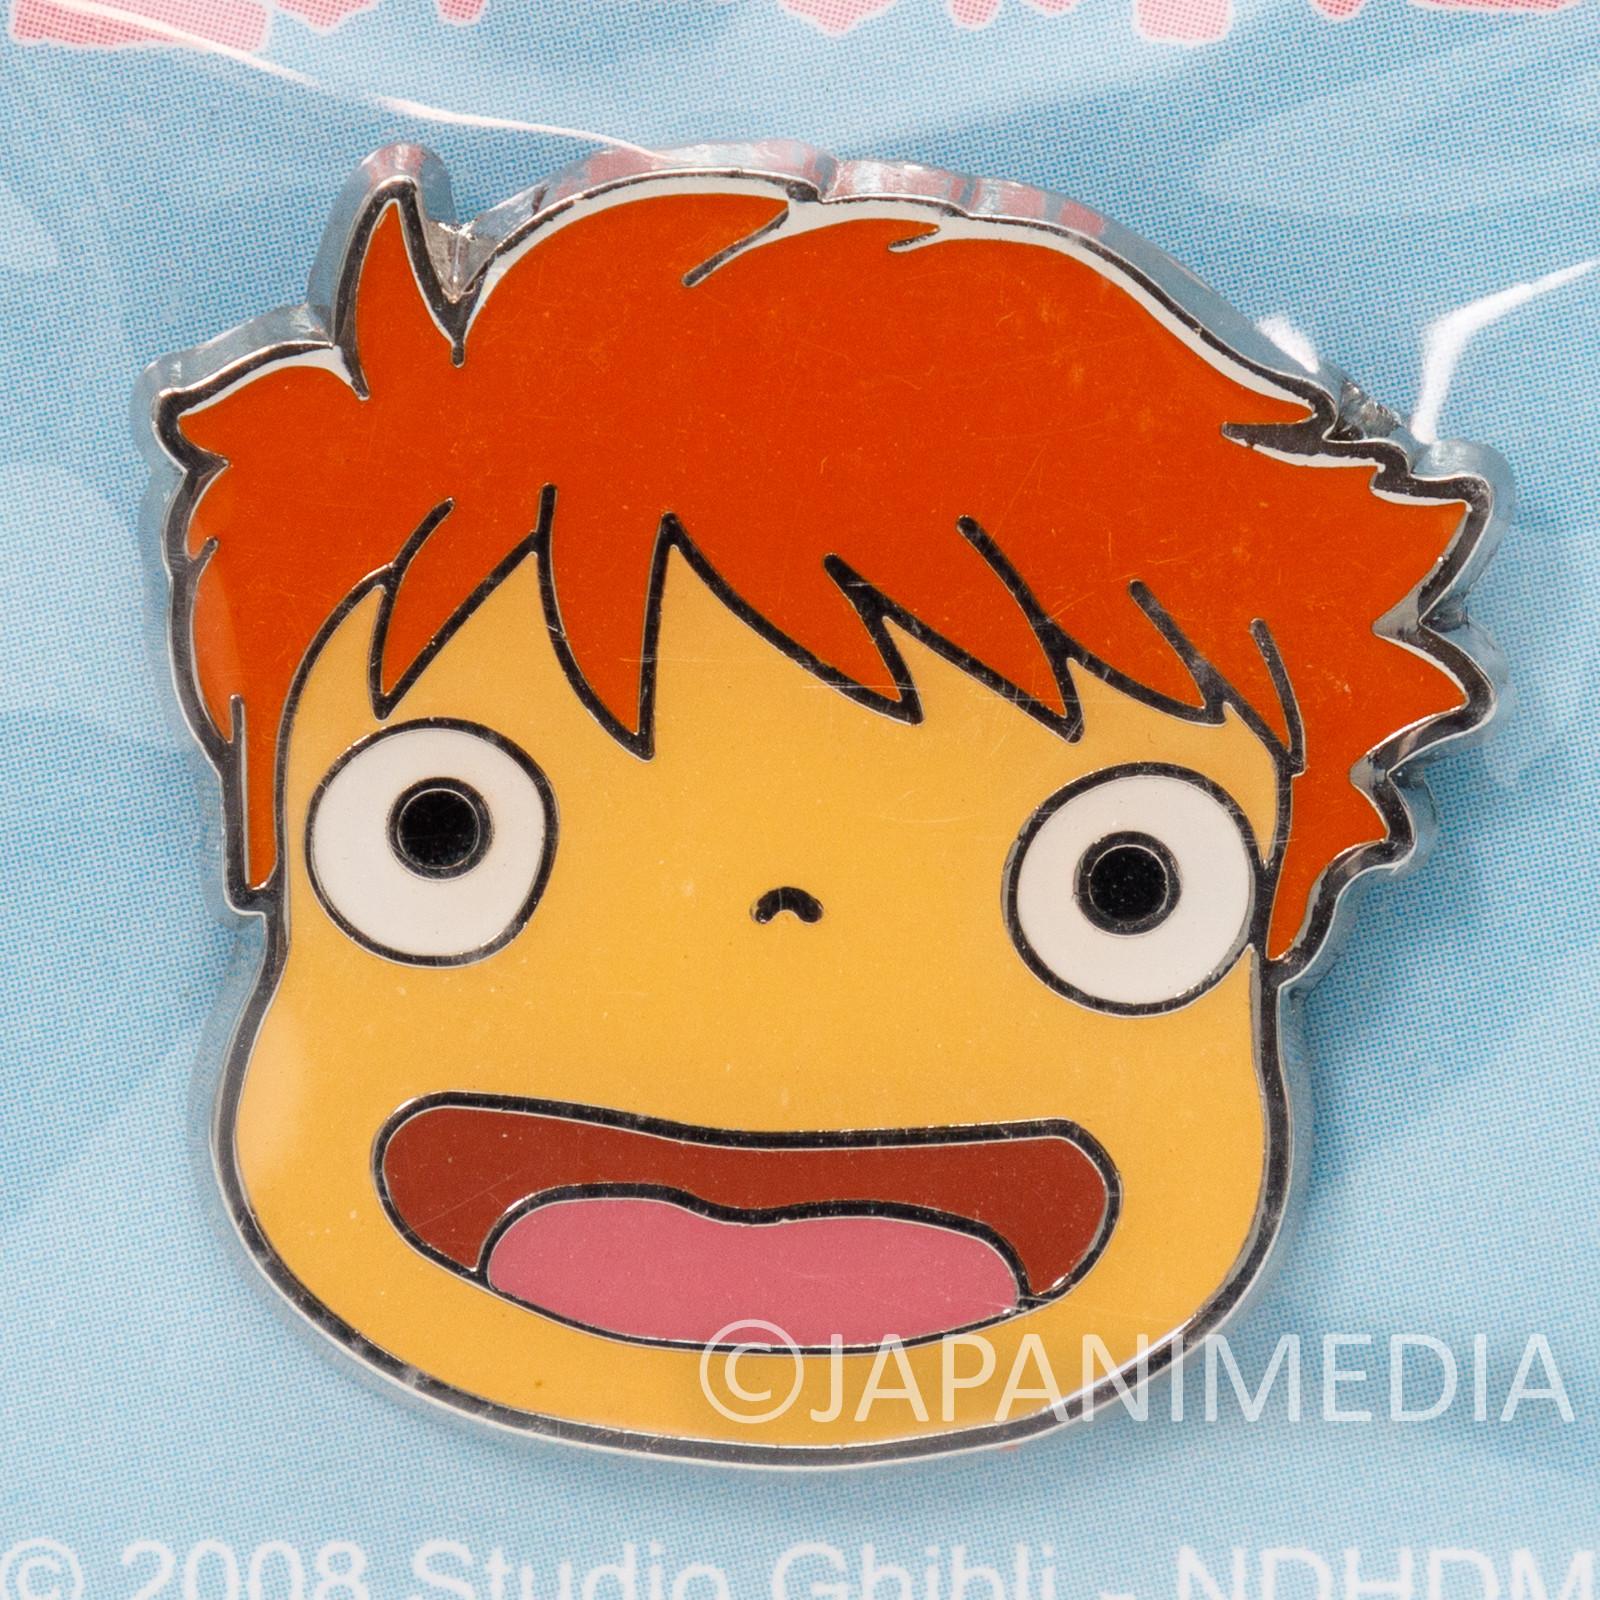 Ponyo on the Cliff by the Sea Metal Pins Ghibli JAPAN ANIME MANGA